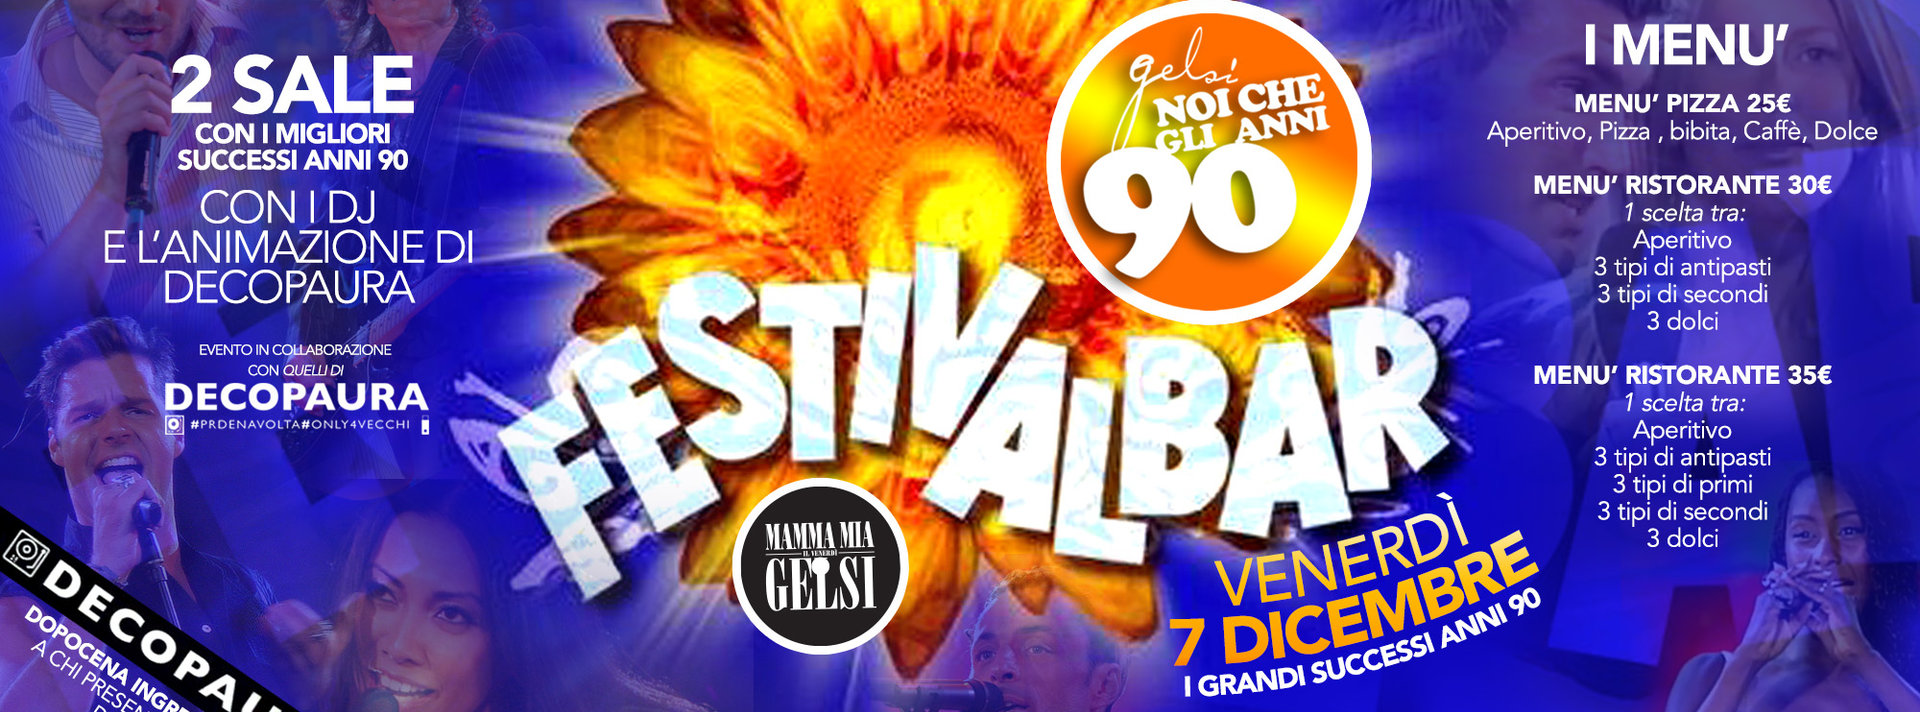 Festivalbar Gelsi - Festa anni 90 con Decopaura -